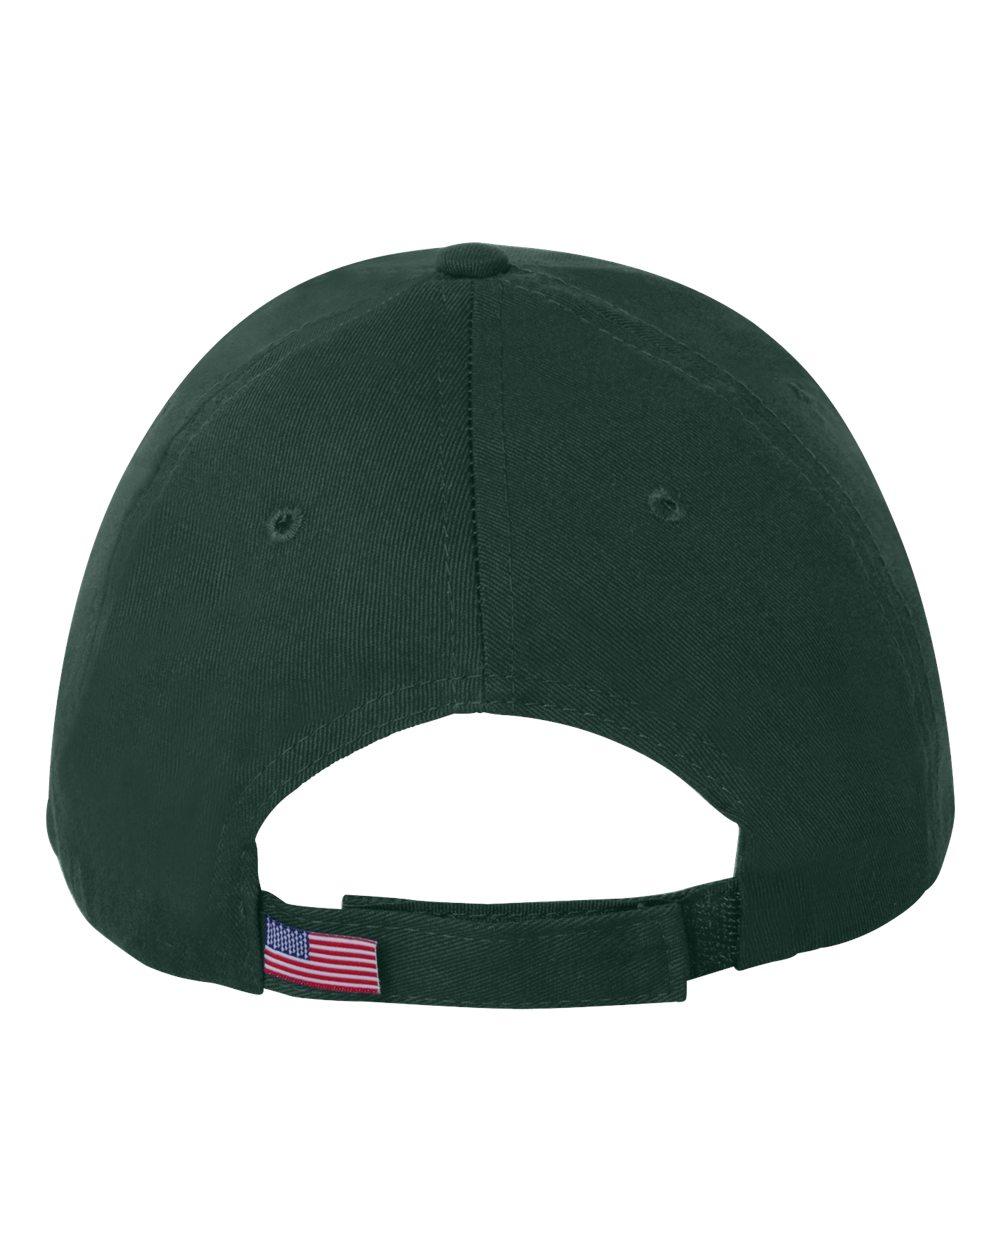 Bayside-Mens-Baseball-USA-Made-Structured-Cap-Hat-3660-six-panel-mid-profile thumbnail 7